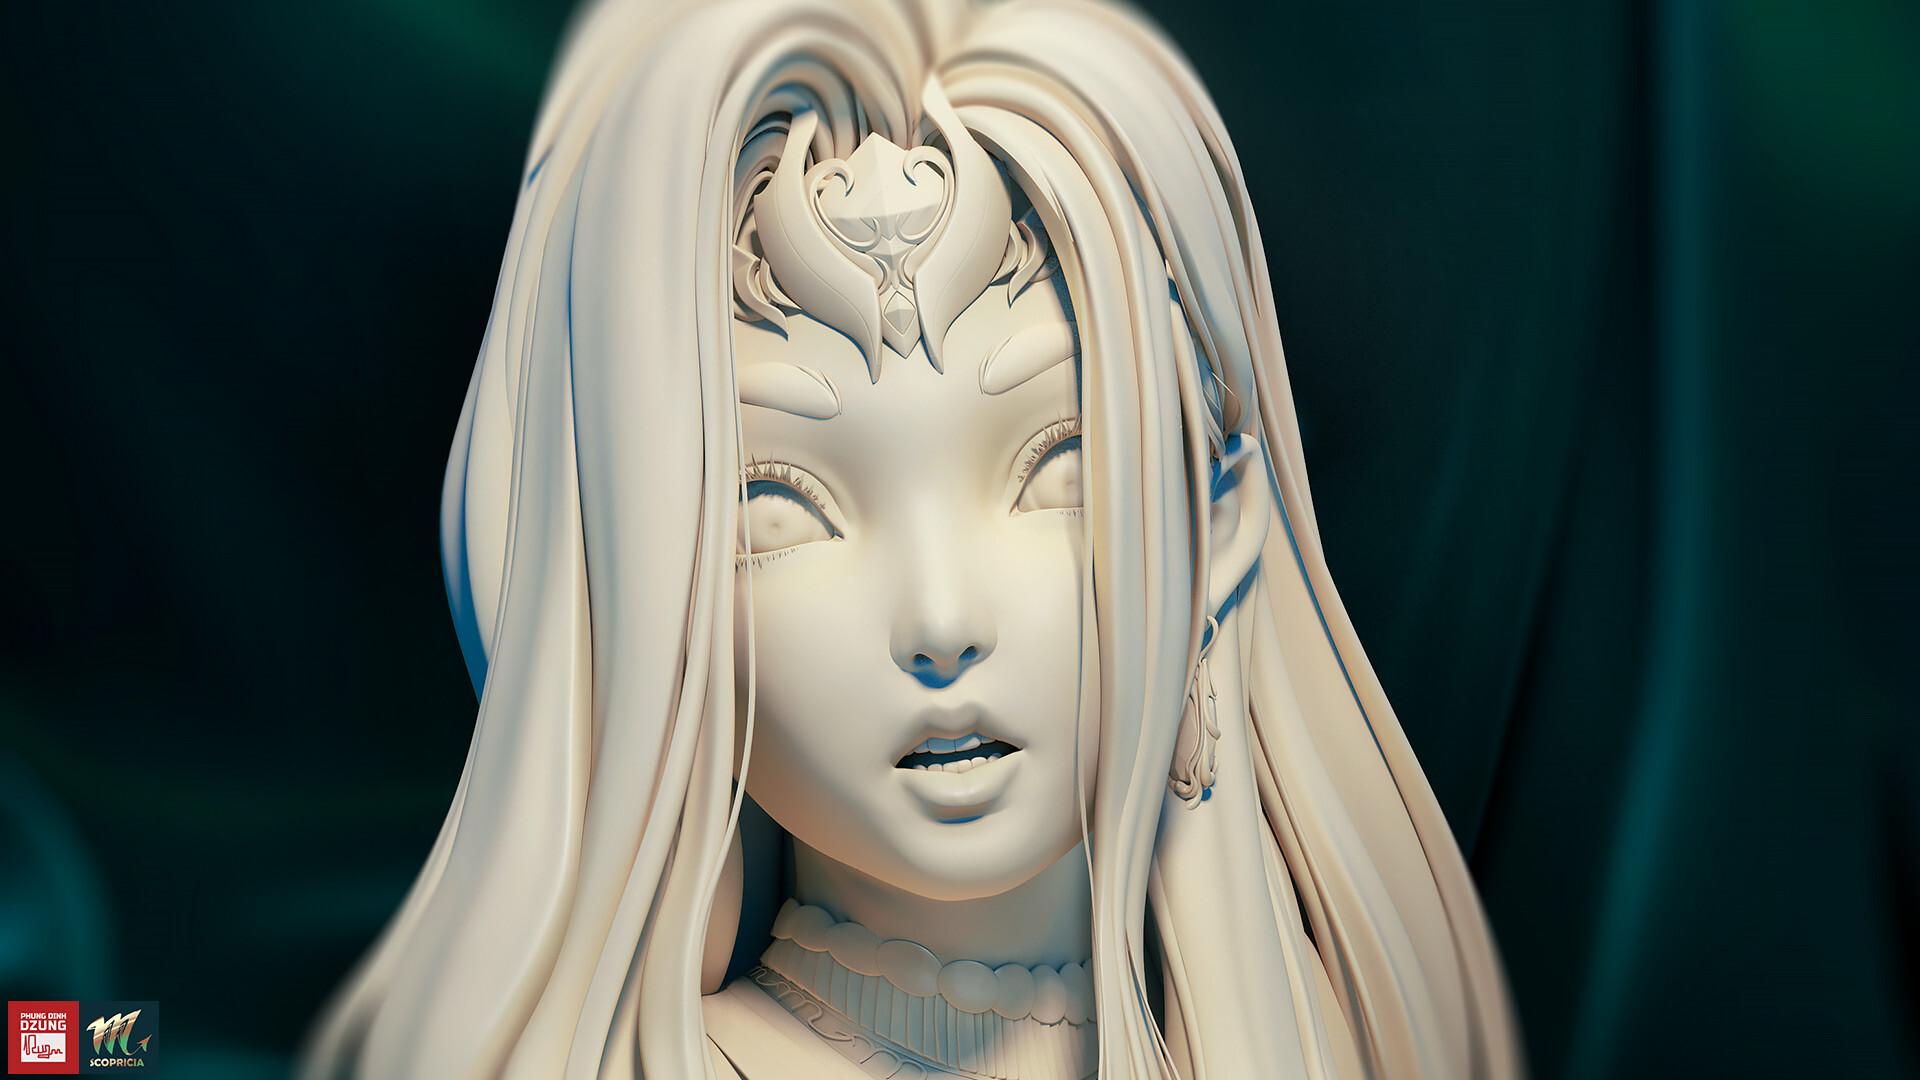 Dzung phung dinh scoprisia bustsculpt support1